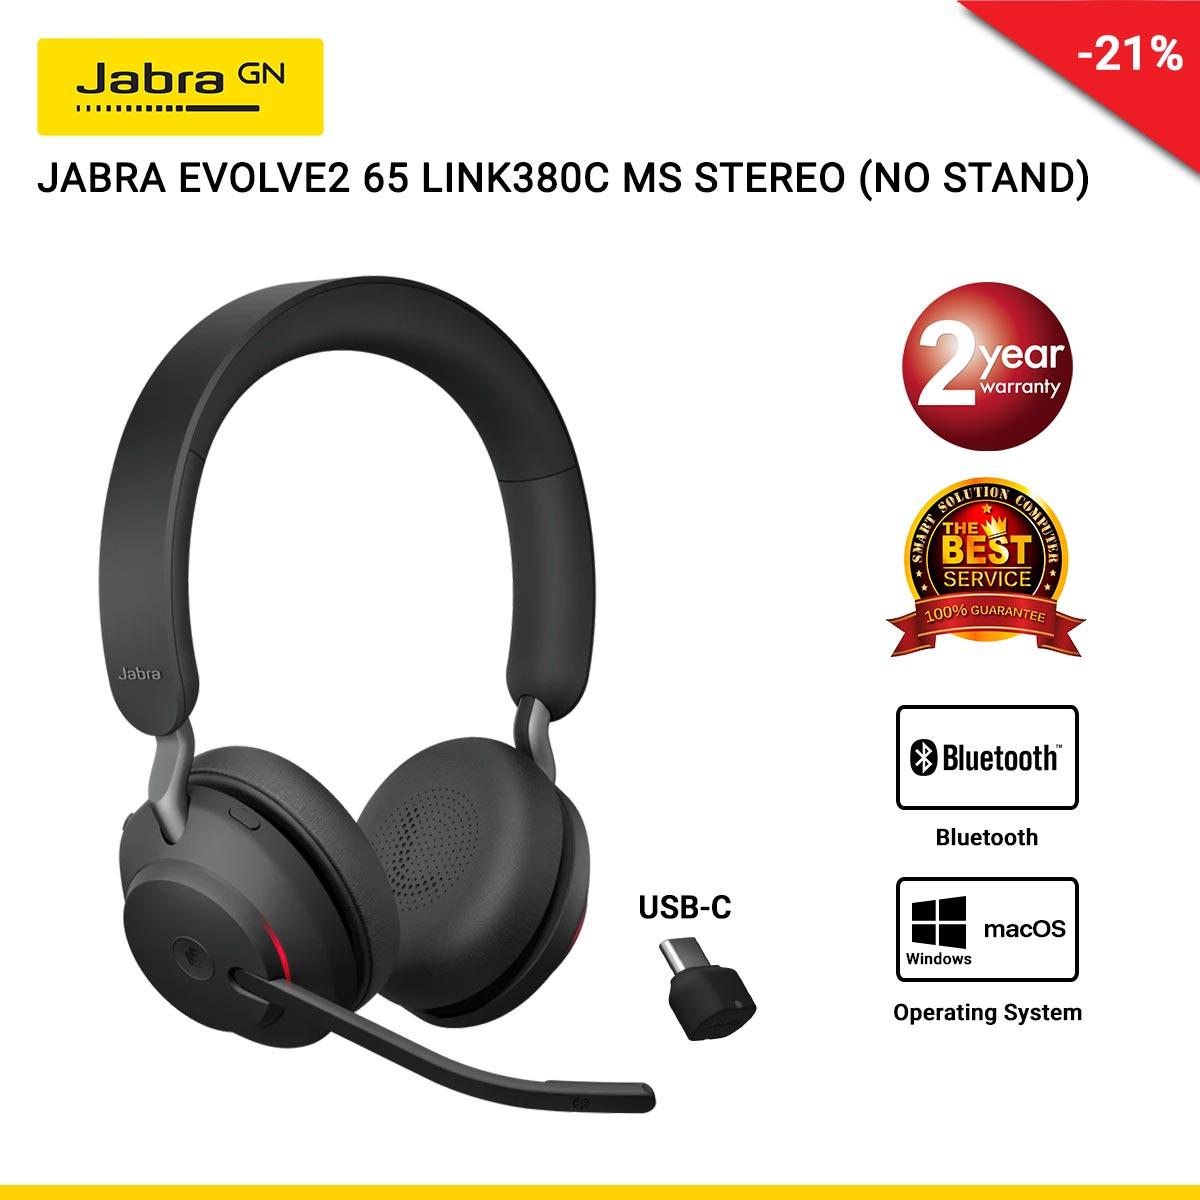 JABRA EVOLVE2 65 LINK380C MS STEREO BLACK (NO STAND) (JBA-26599-999-899)